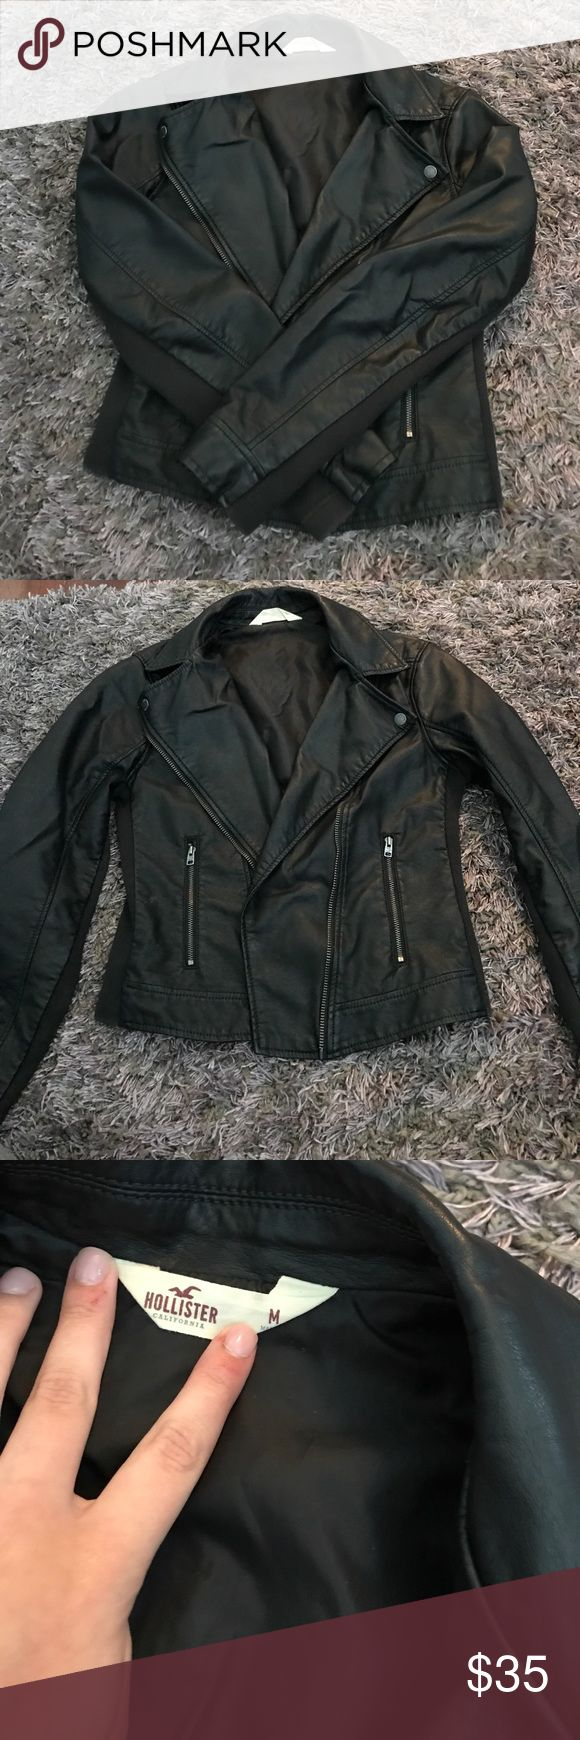 Hollis tee Faux leather jacket Black faux leather jacket Hollister Jackets & Coats